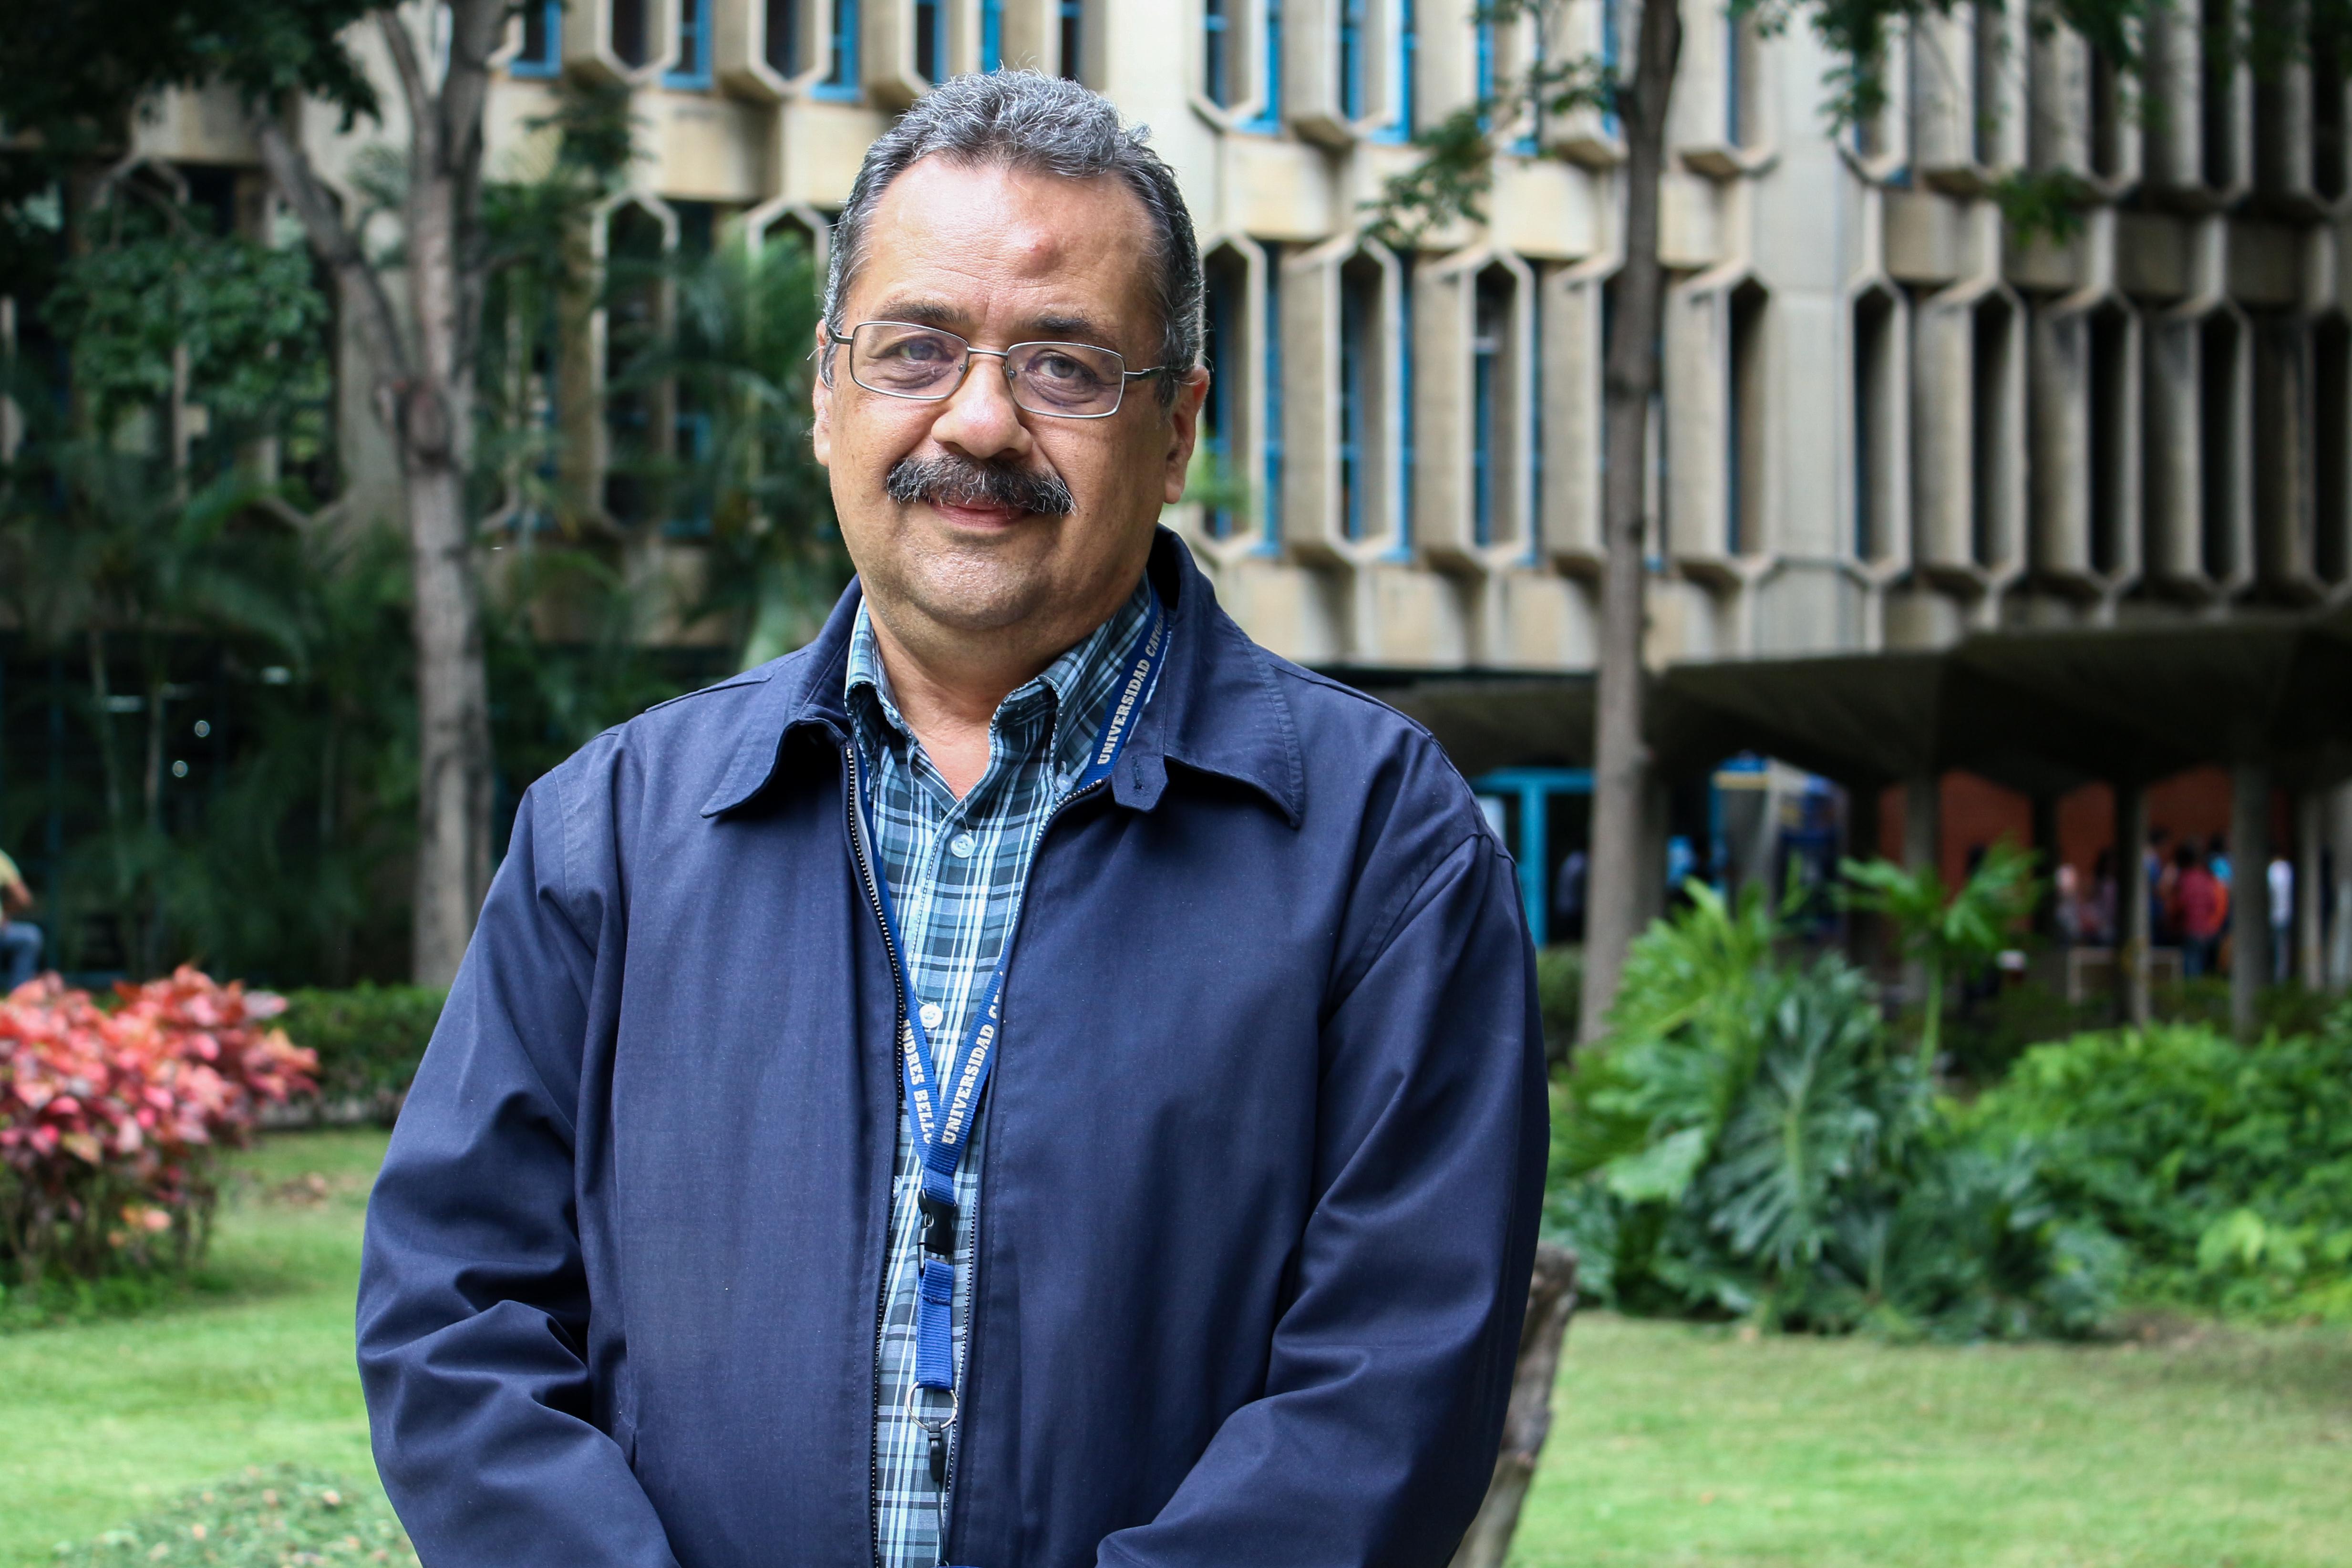 Profesores que inspiran: Pedro Vicente Navarro